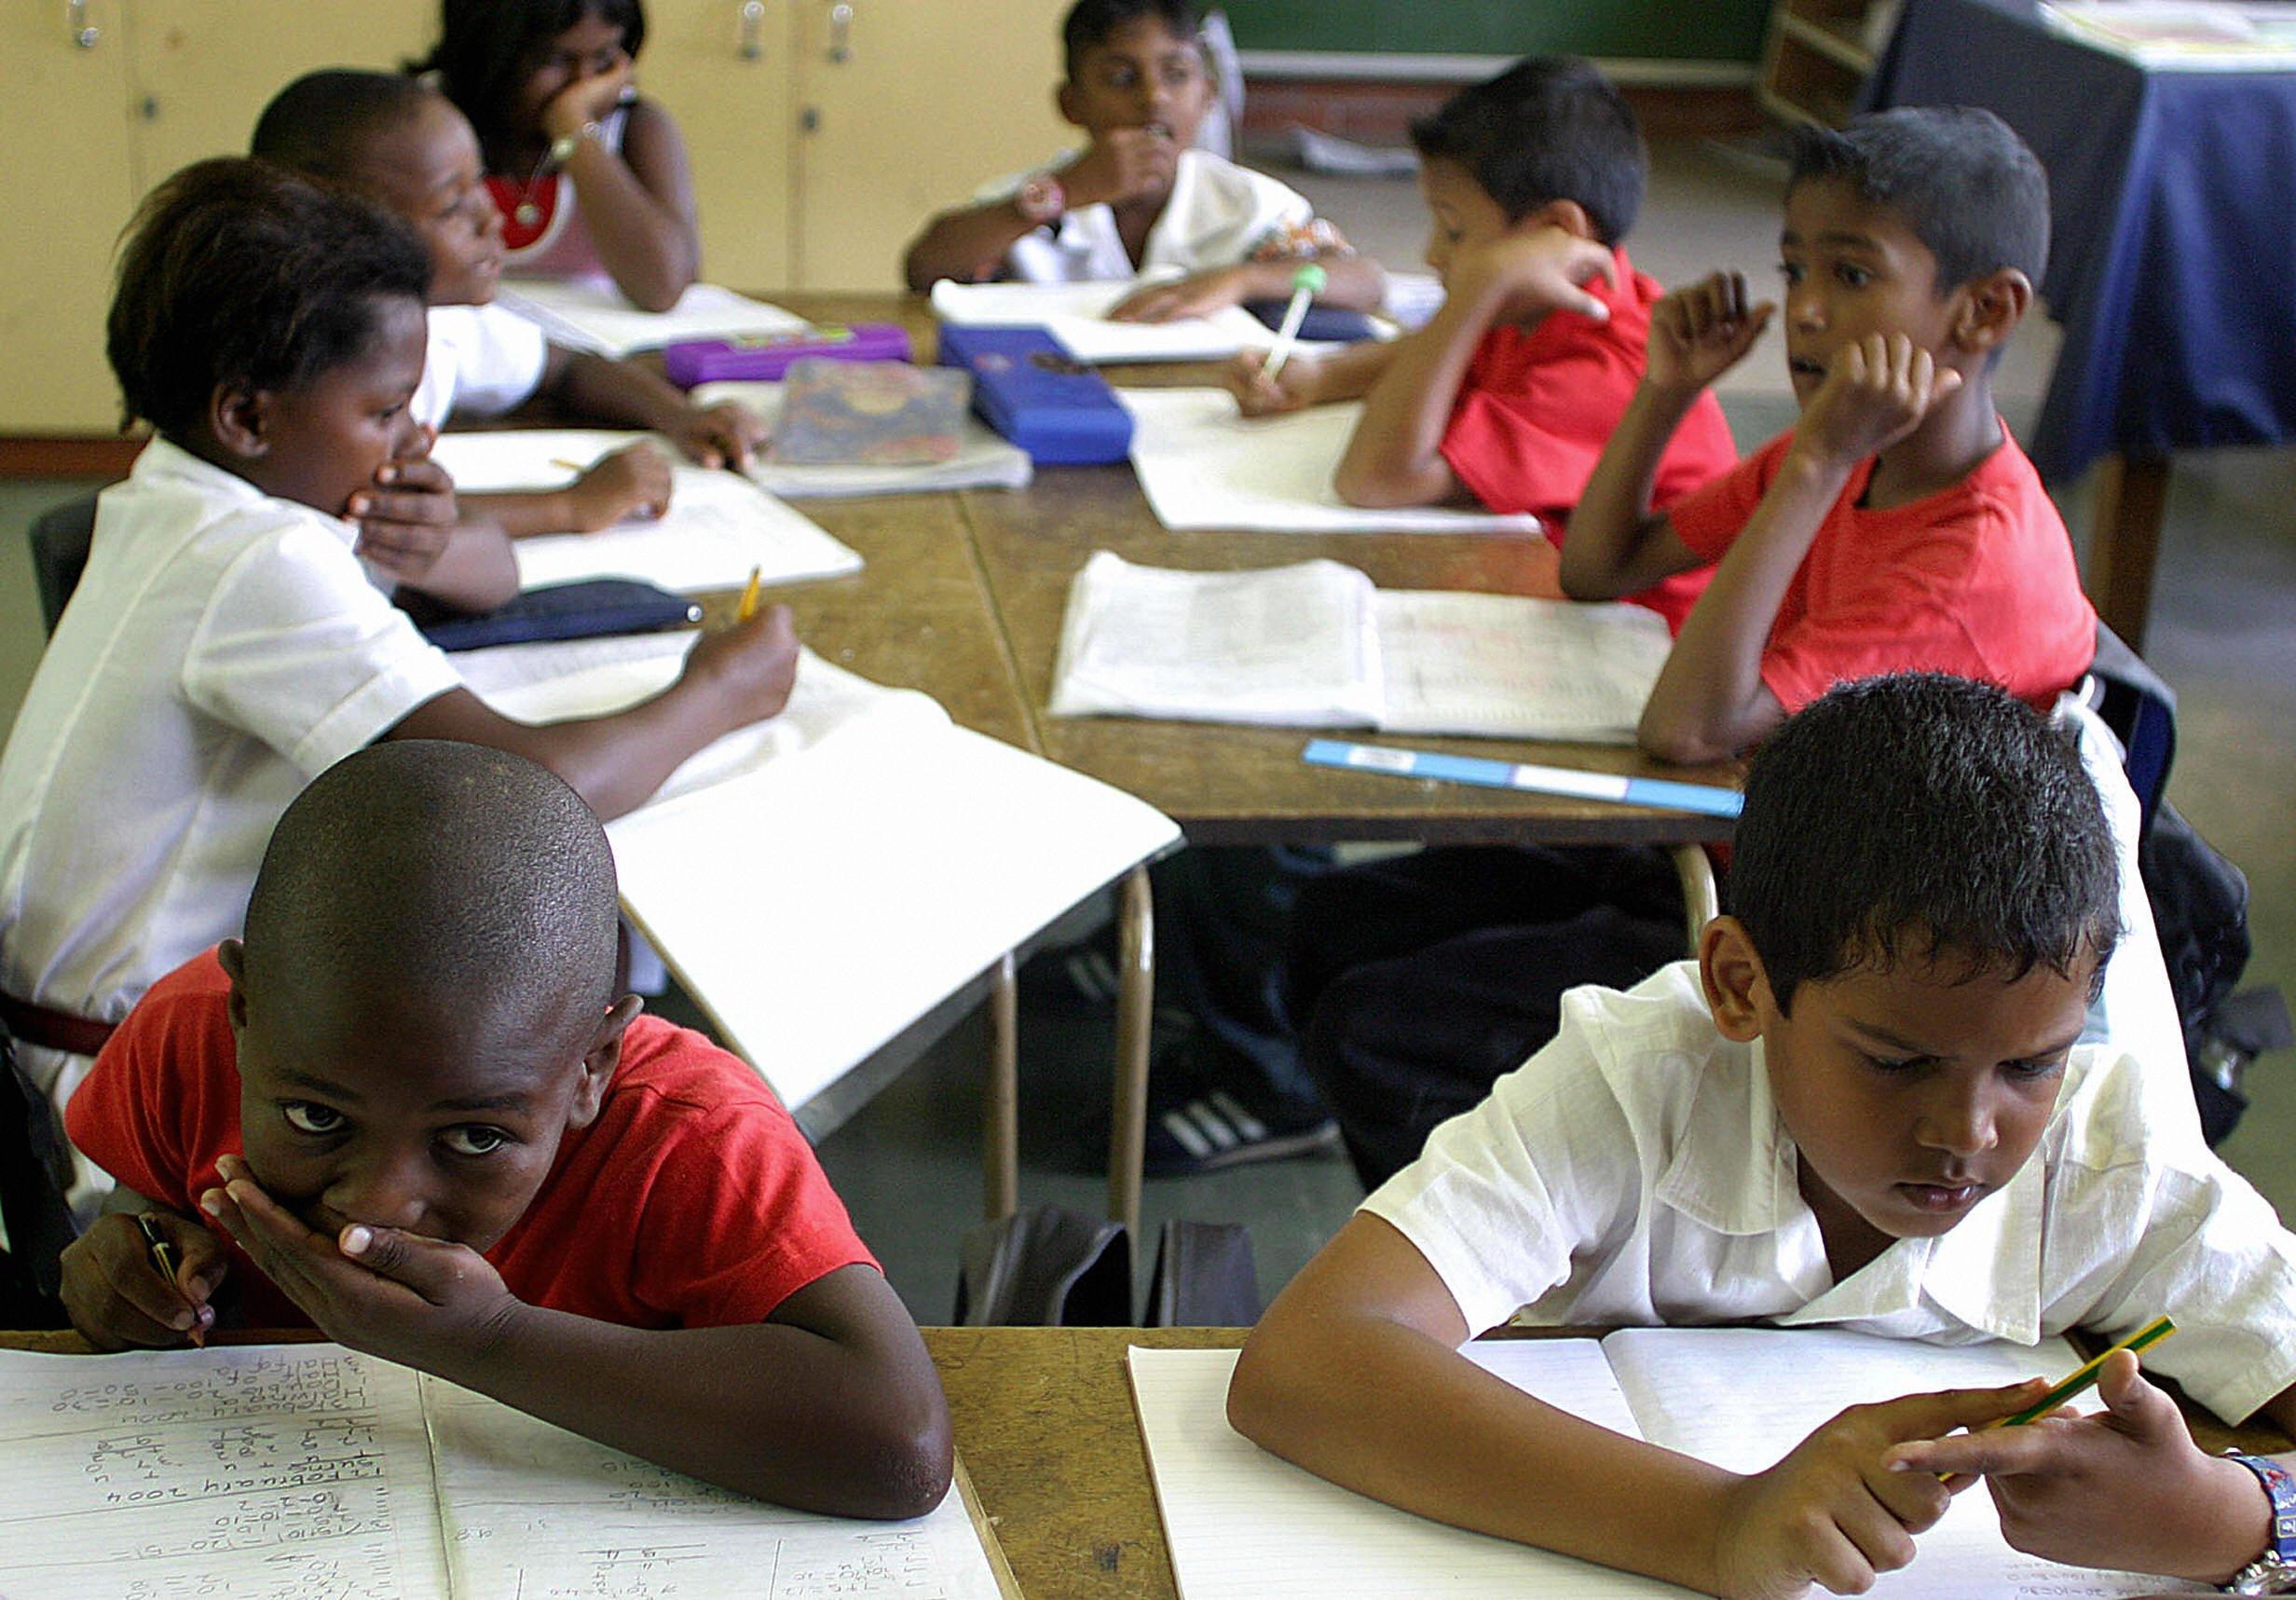 School children in class in Durban, South Africa